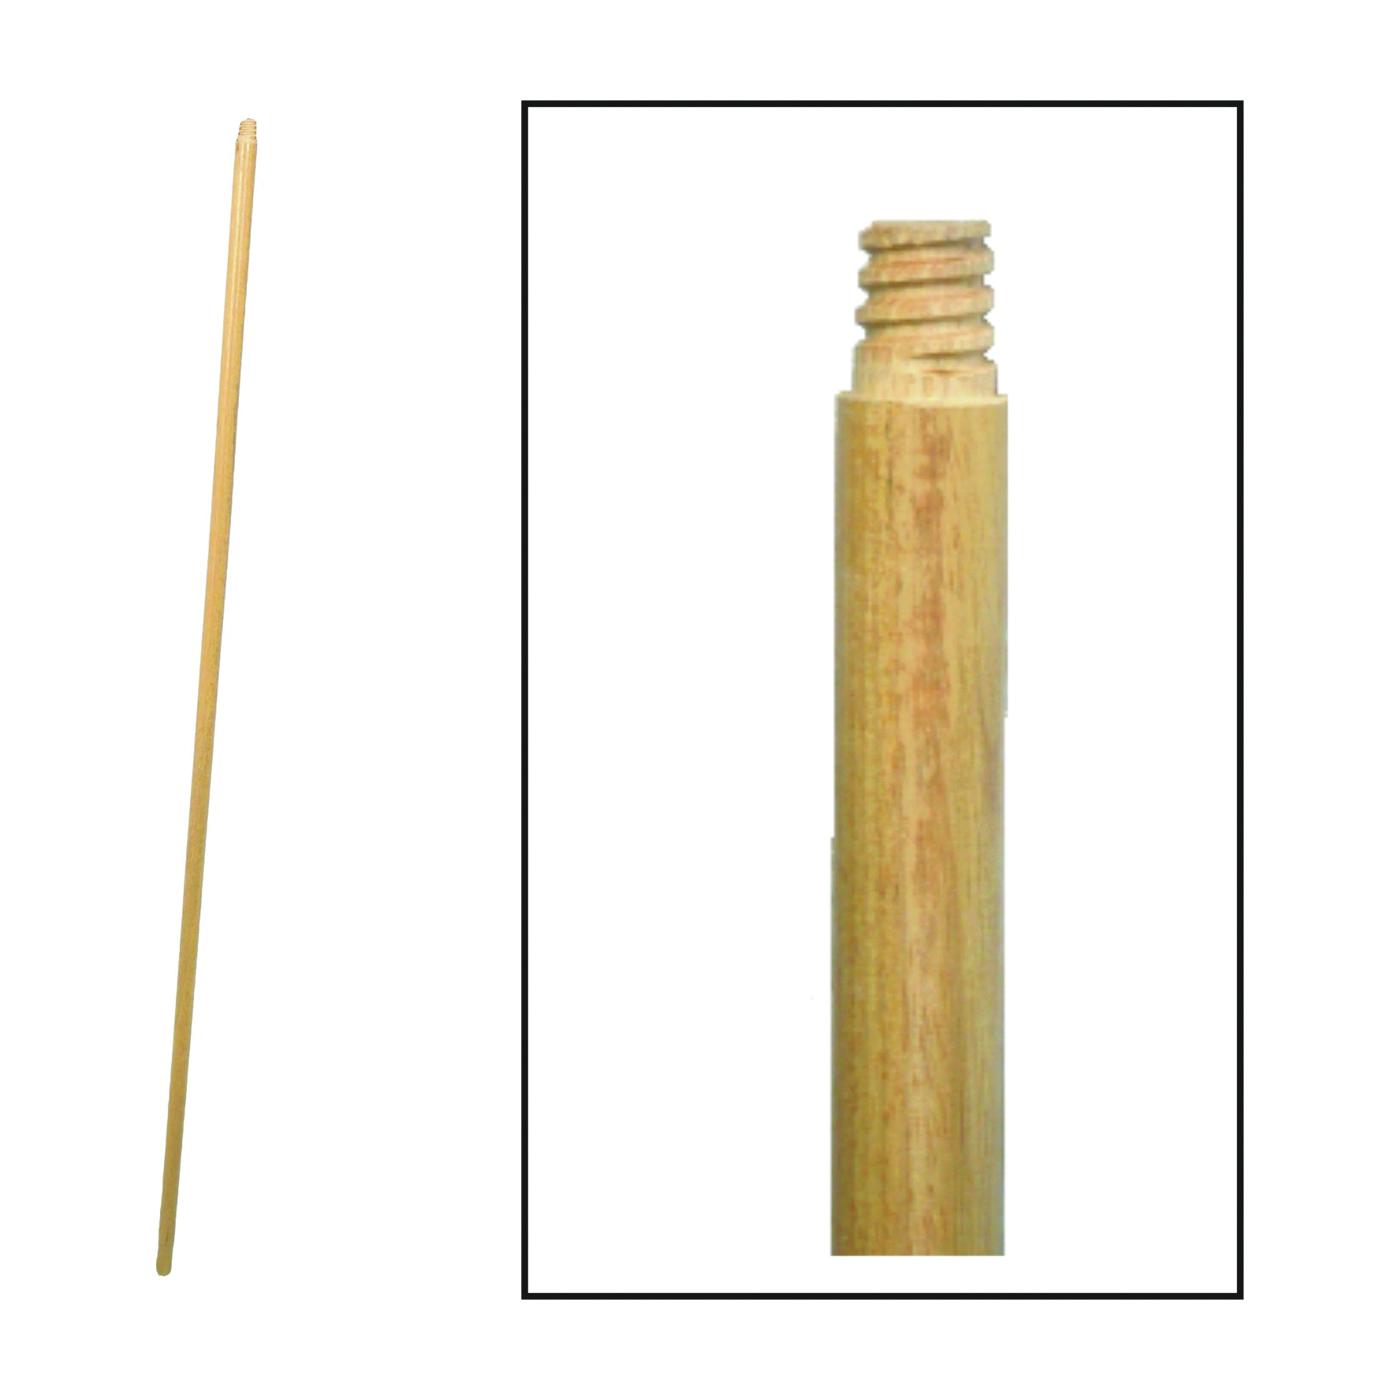 Picture of BIRDWELL 532-12 Broom Handle, 15/16 in Dia, 48 in L, Threaded, Hardwood